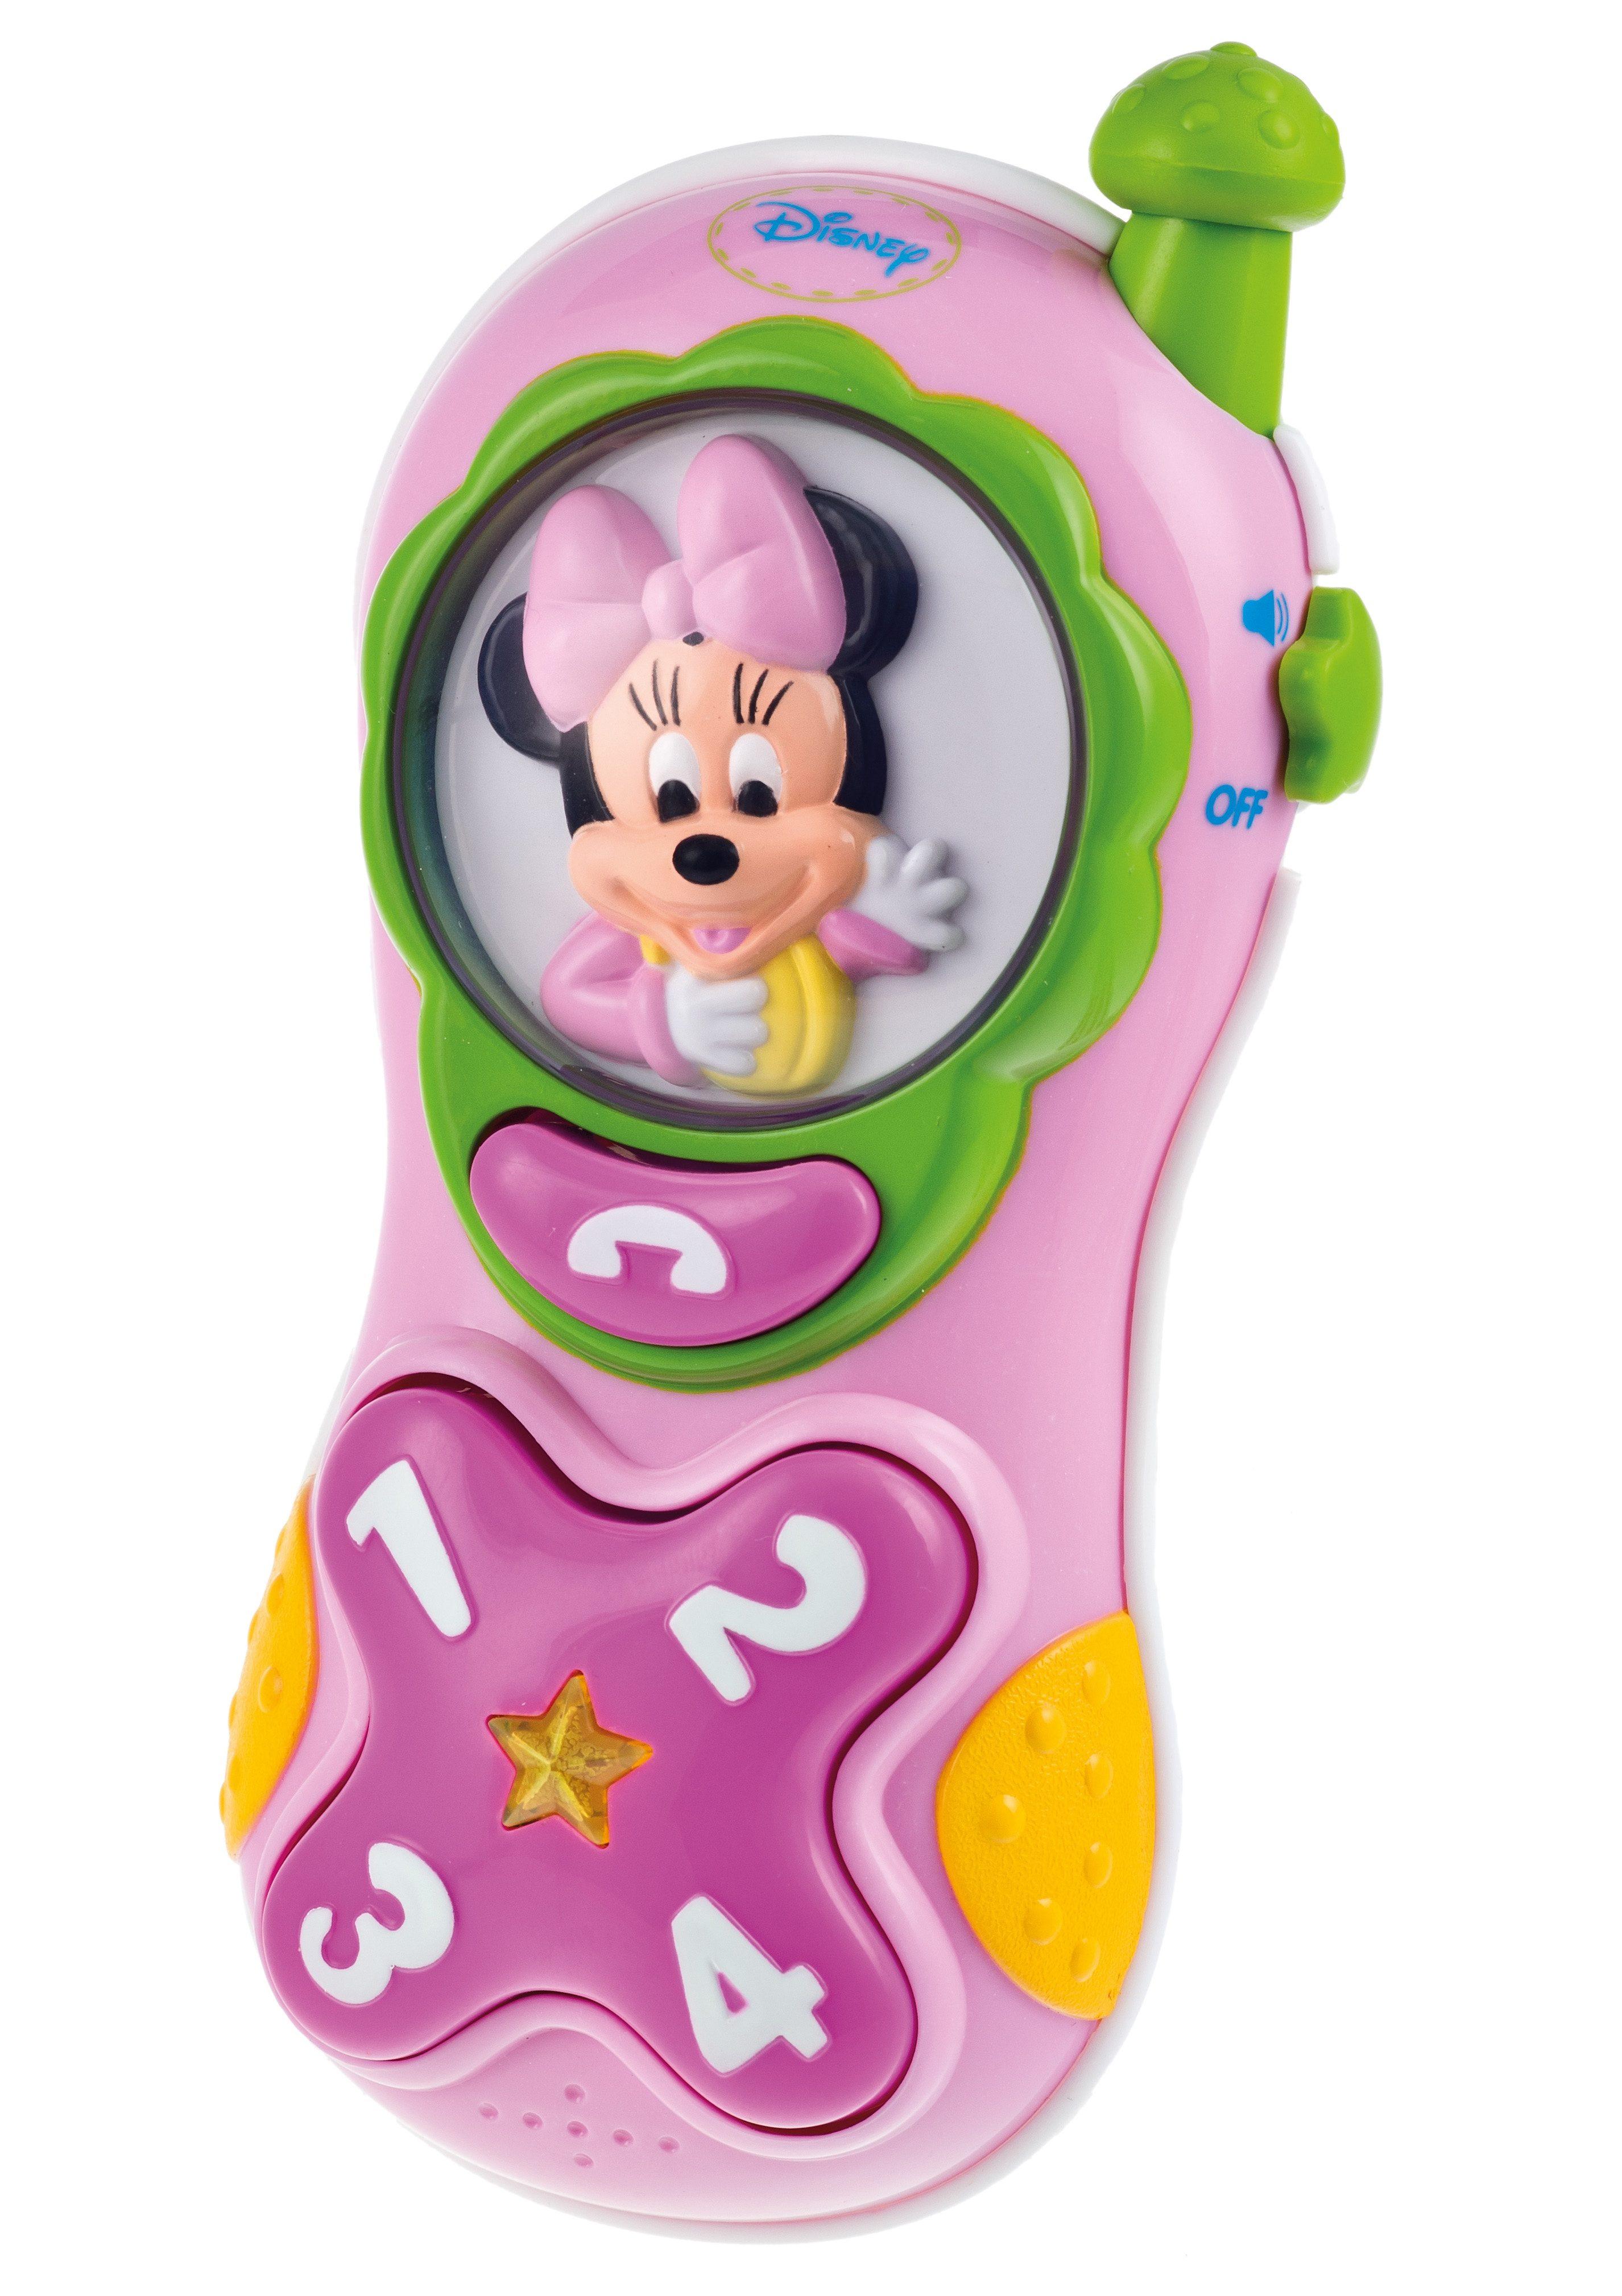 Clementoni Spielzeug Handy, »Minnies Handy«